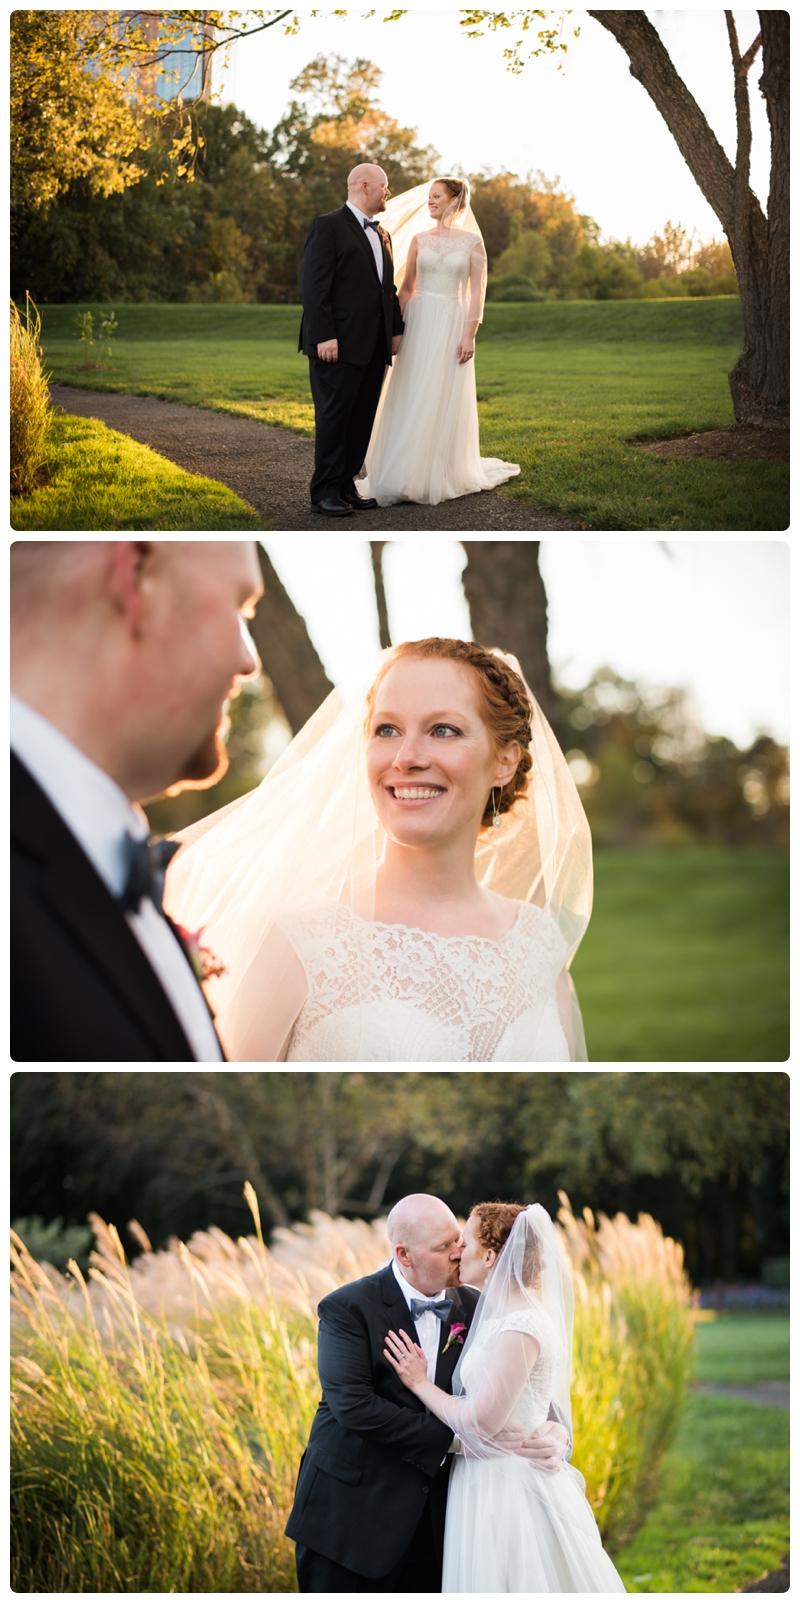 Wedding in Falls Church Virginia by Rachael Foster Photography_0025.jpg